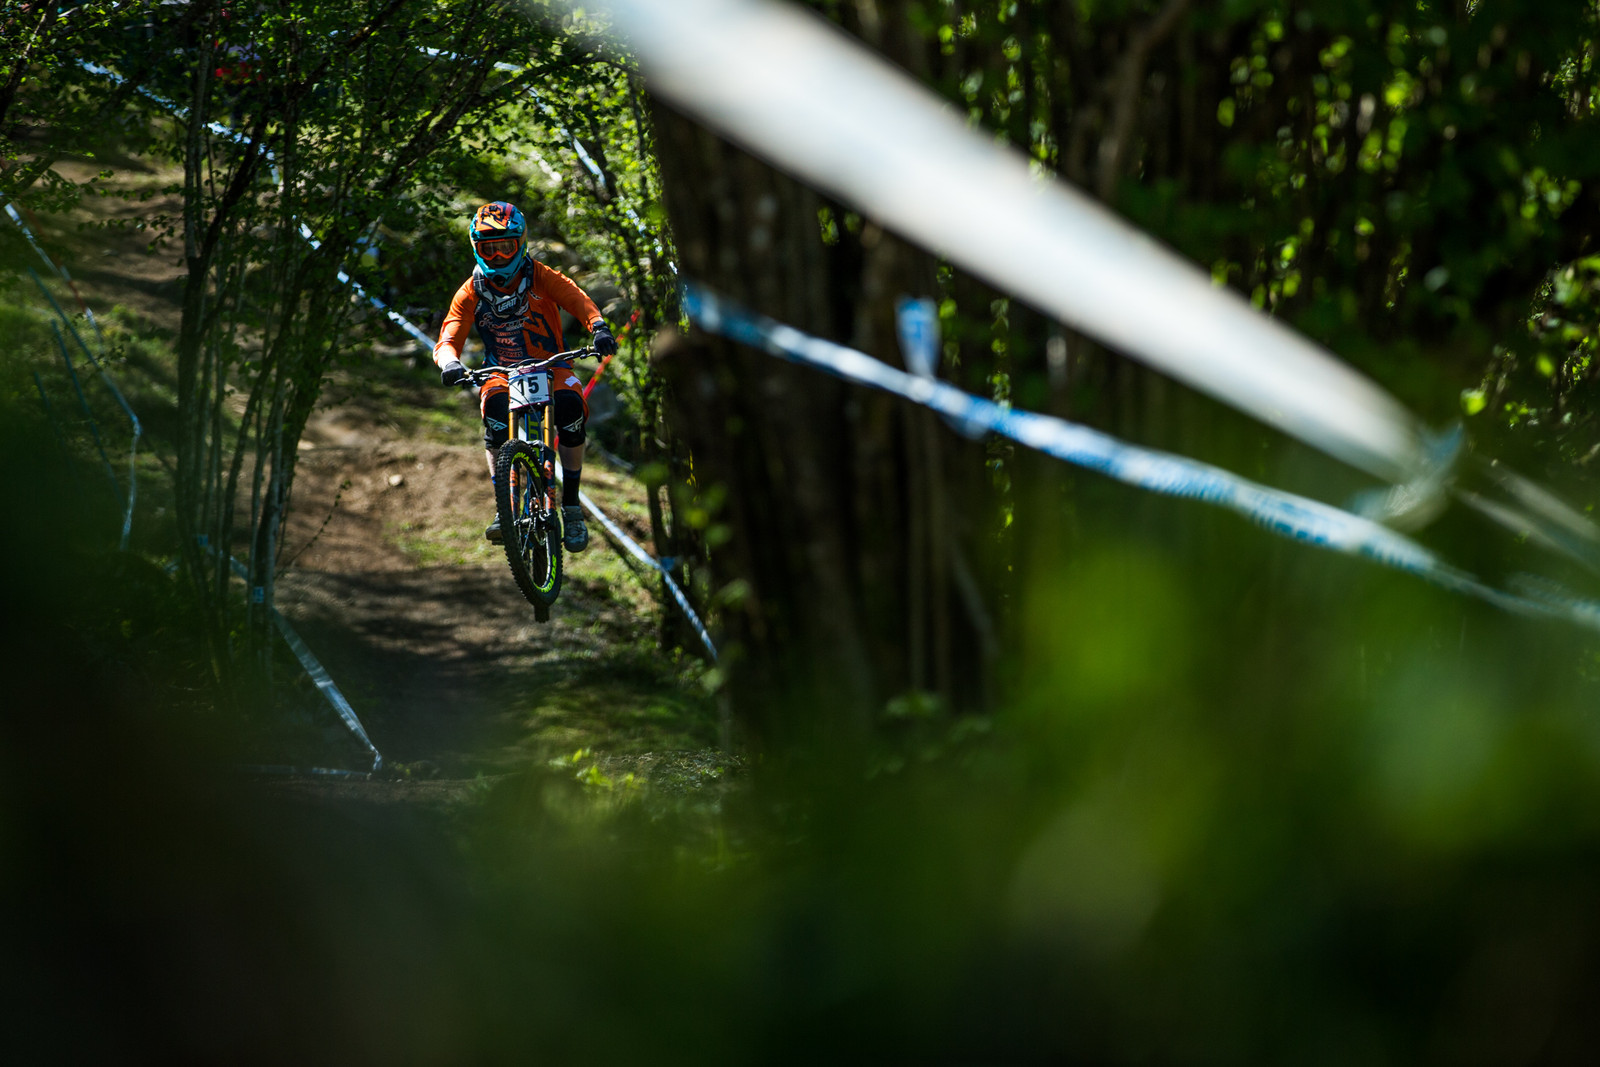 Bernard Kerr - Lourdes World Cup Timed Training Action Photos - Mountain Biking Pictures - Vital MTB